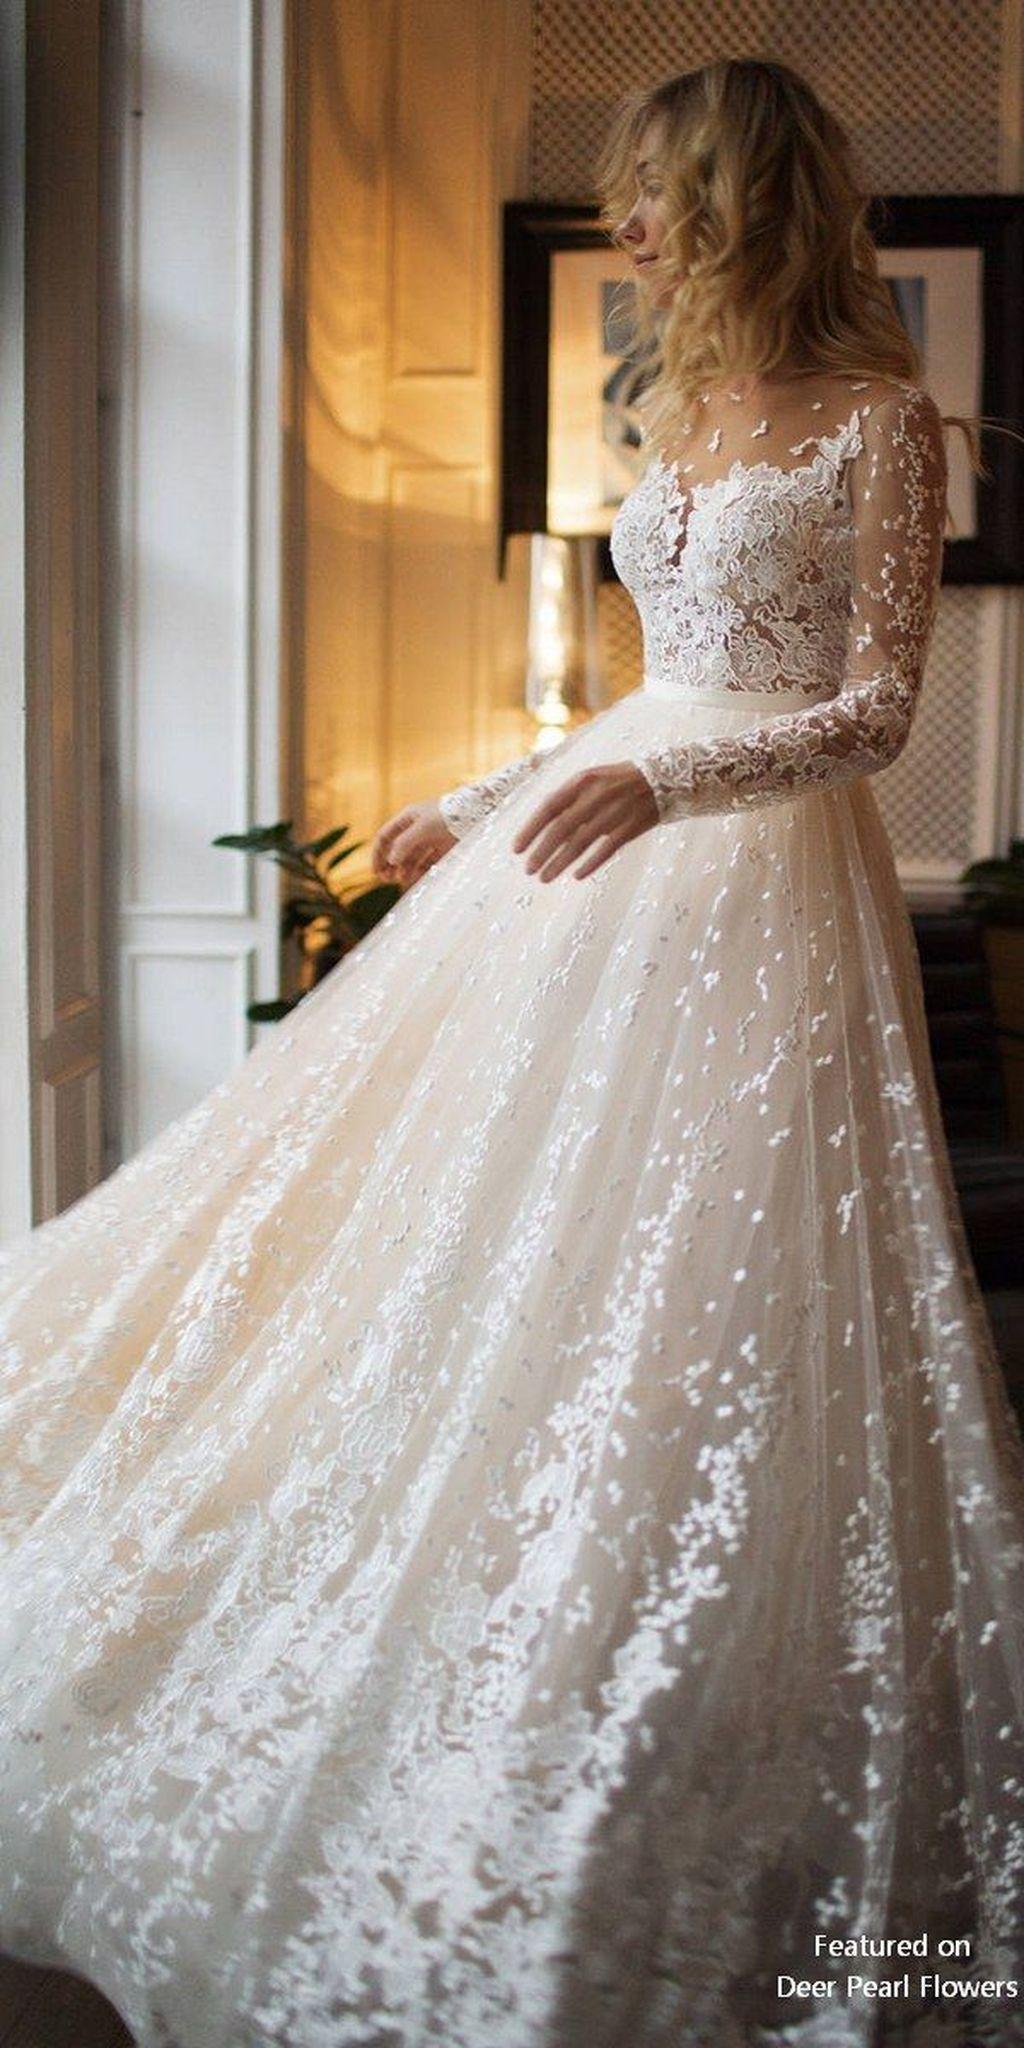 37 Unique Sleeve Wedding Dress Trends Ideas | Wedding dress long sleeve, Dream wedding dresses, Wedding dress sleeves